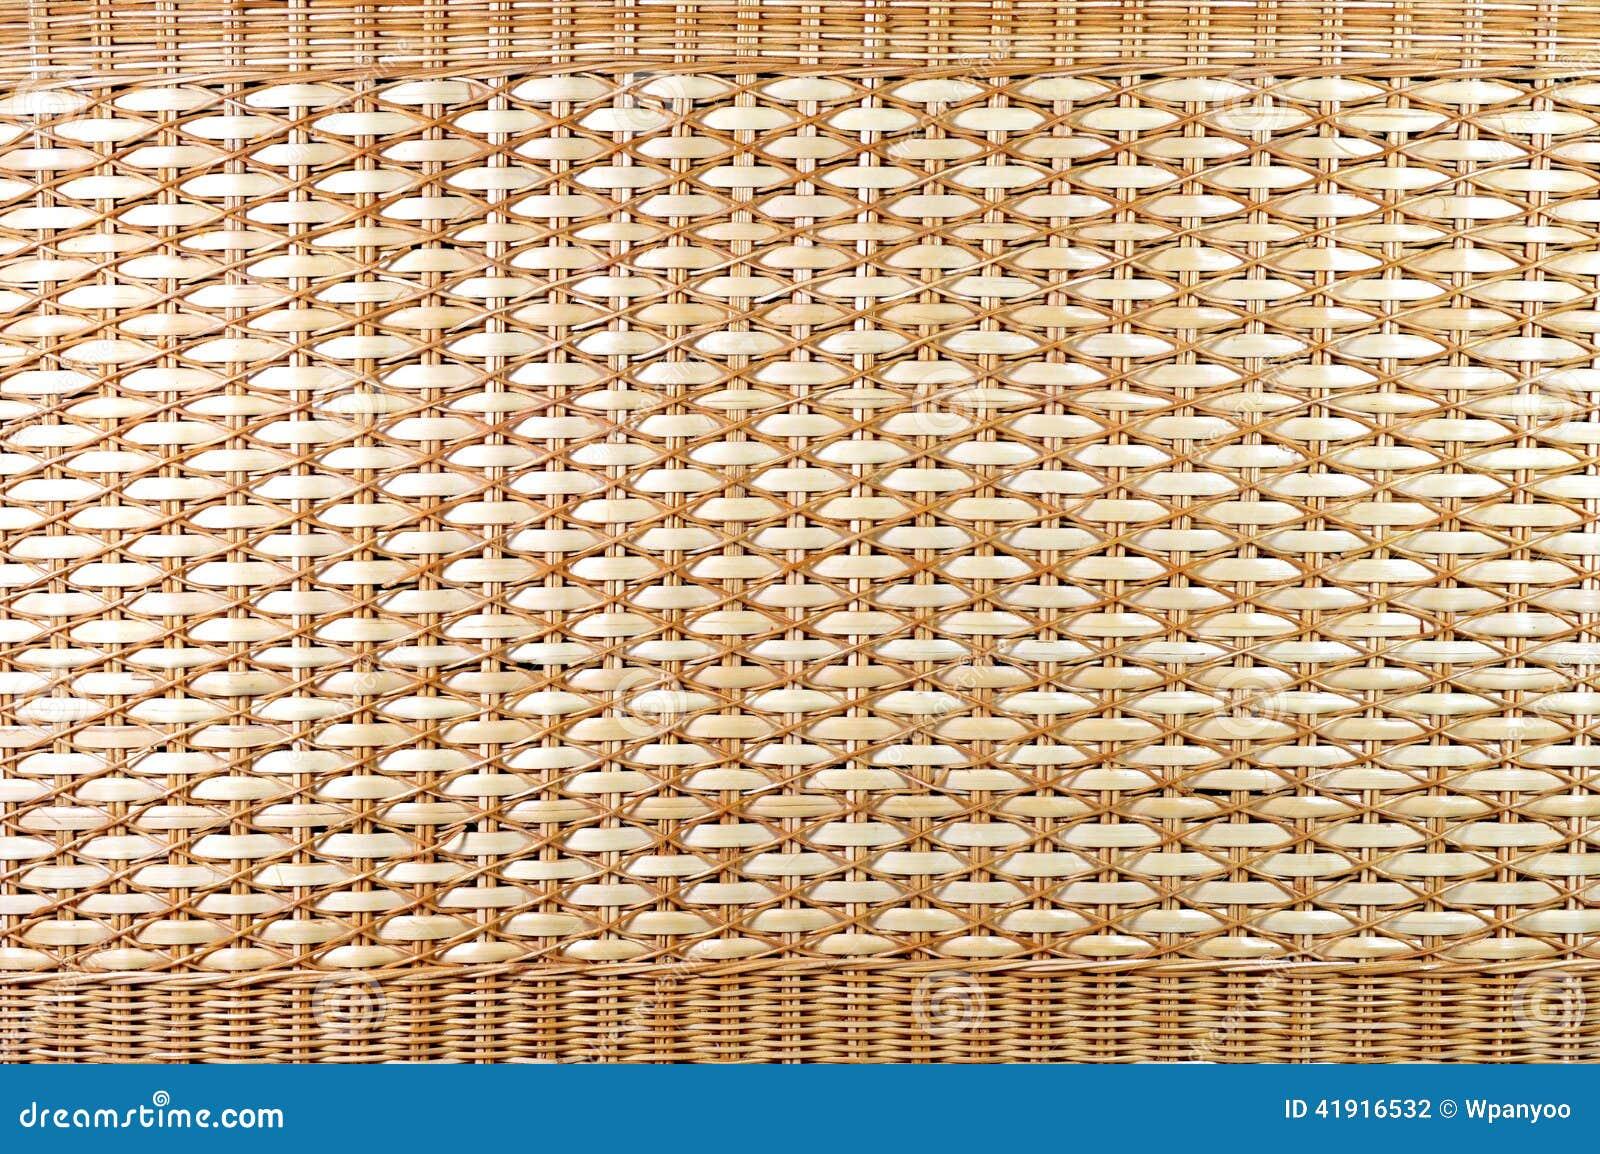 Textura tailandesa de la cesta de mimbre